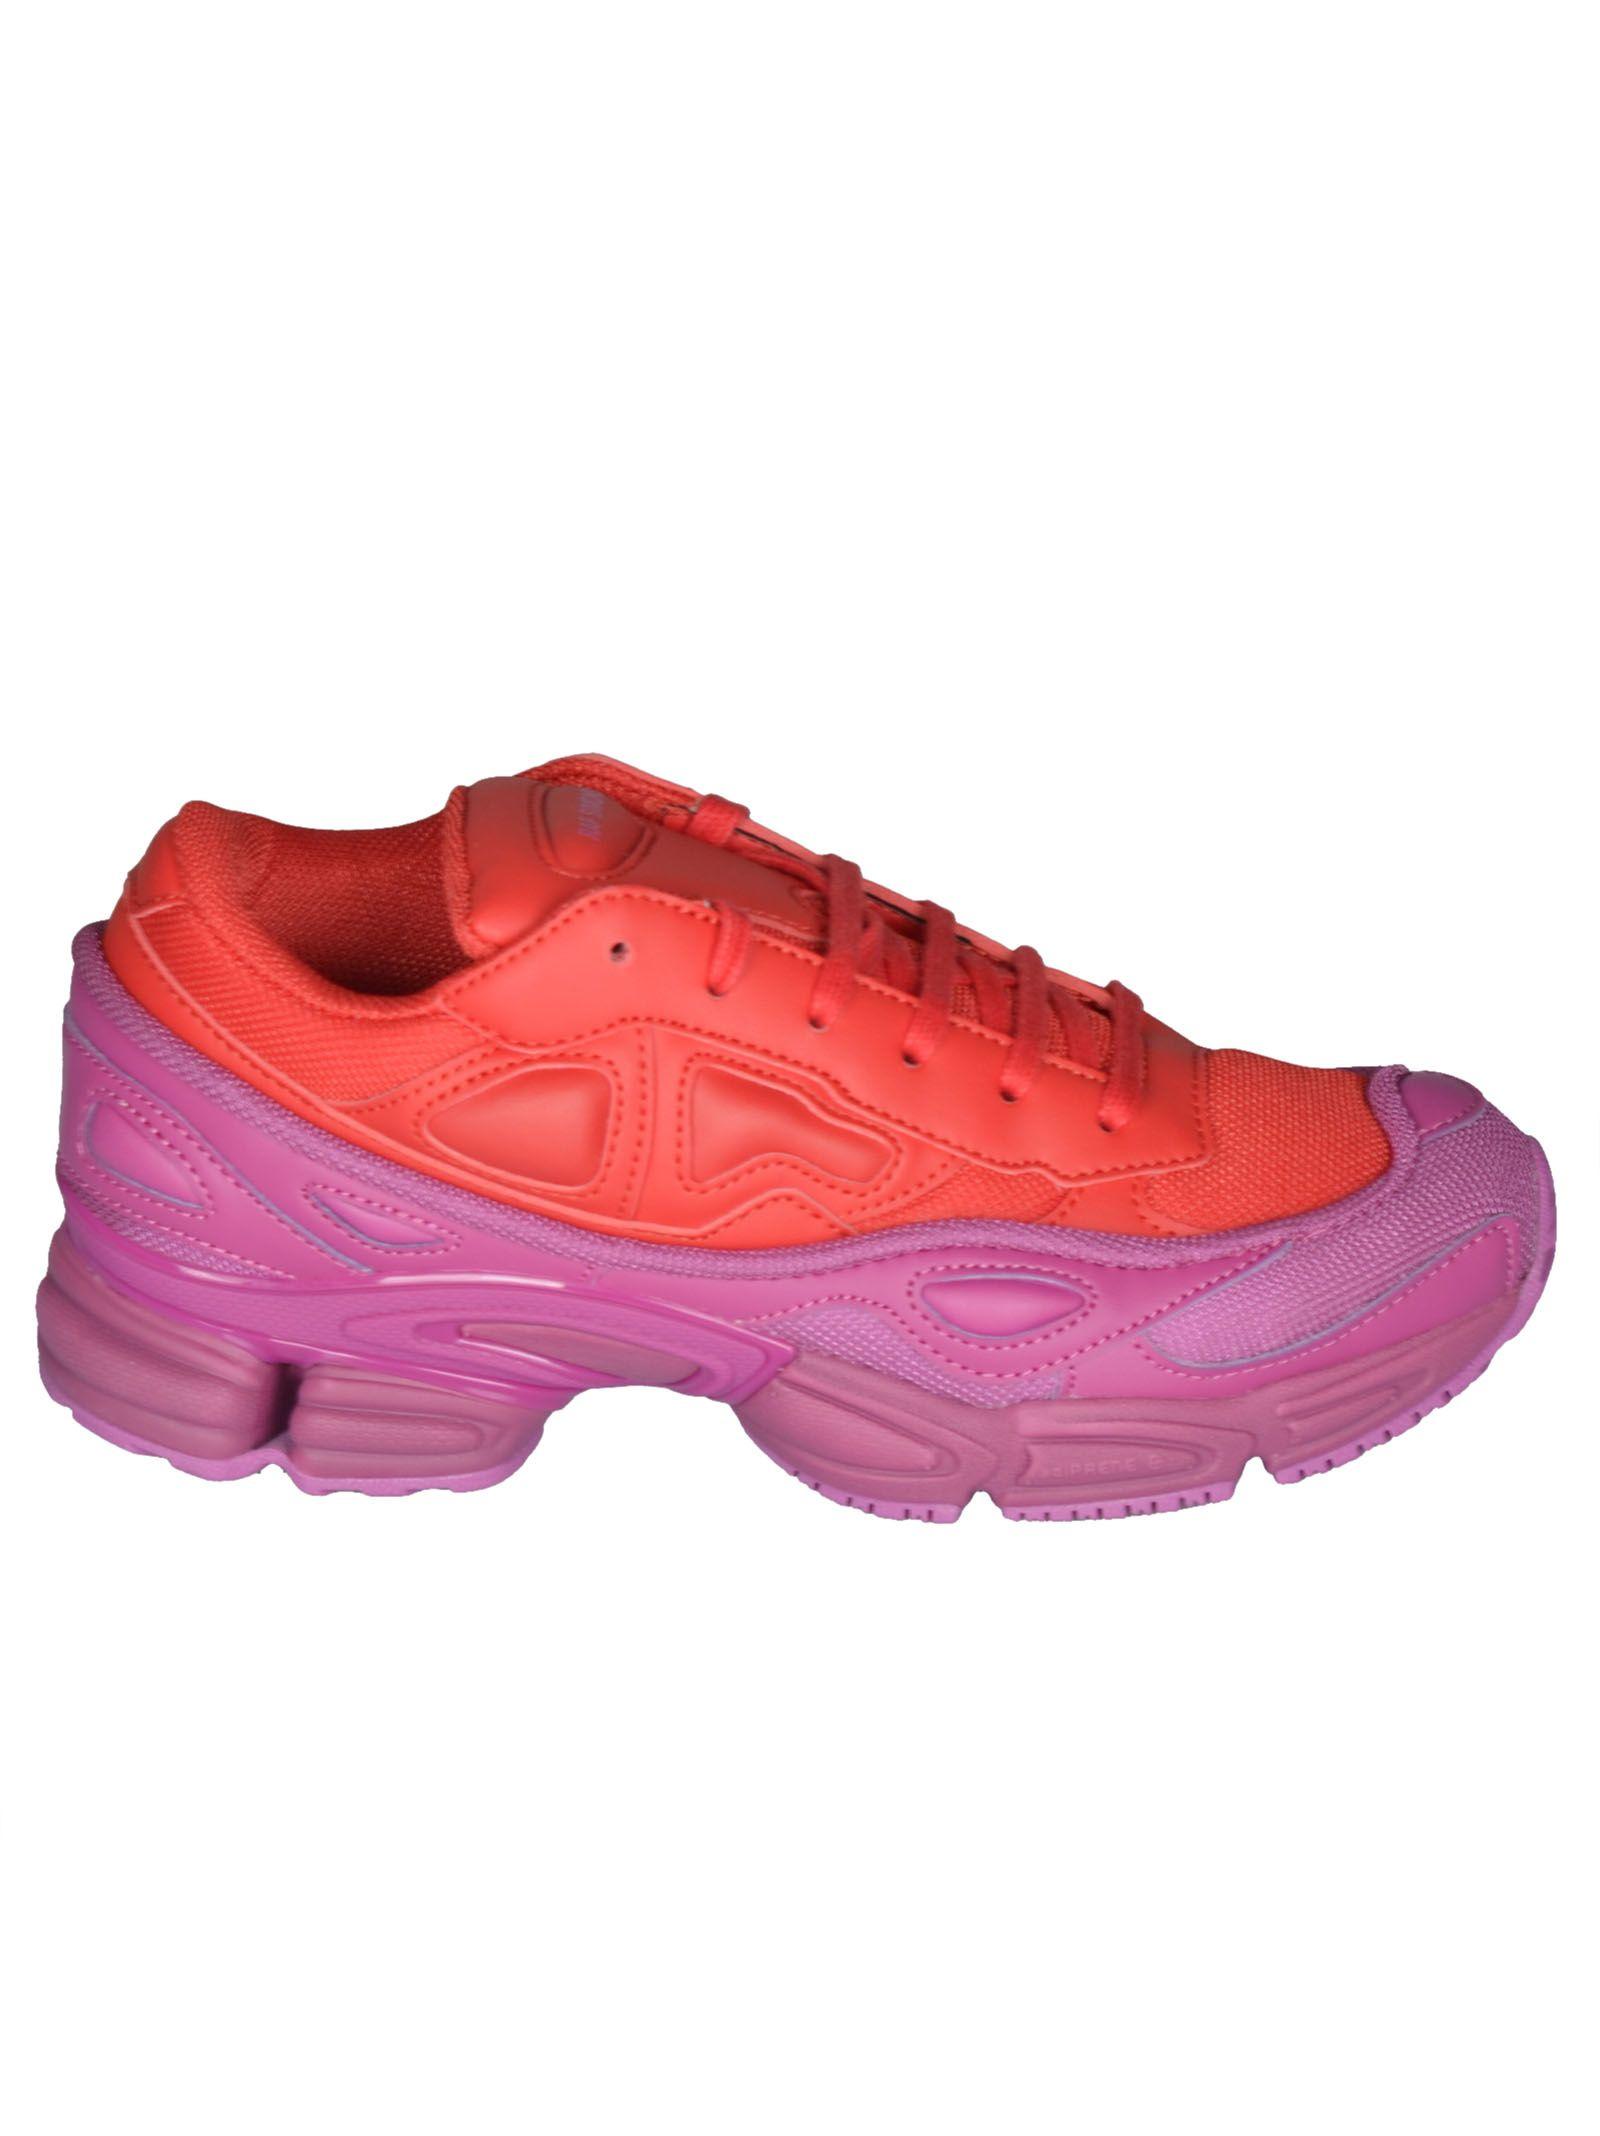 Ozweego Sneakers, Glory Red